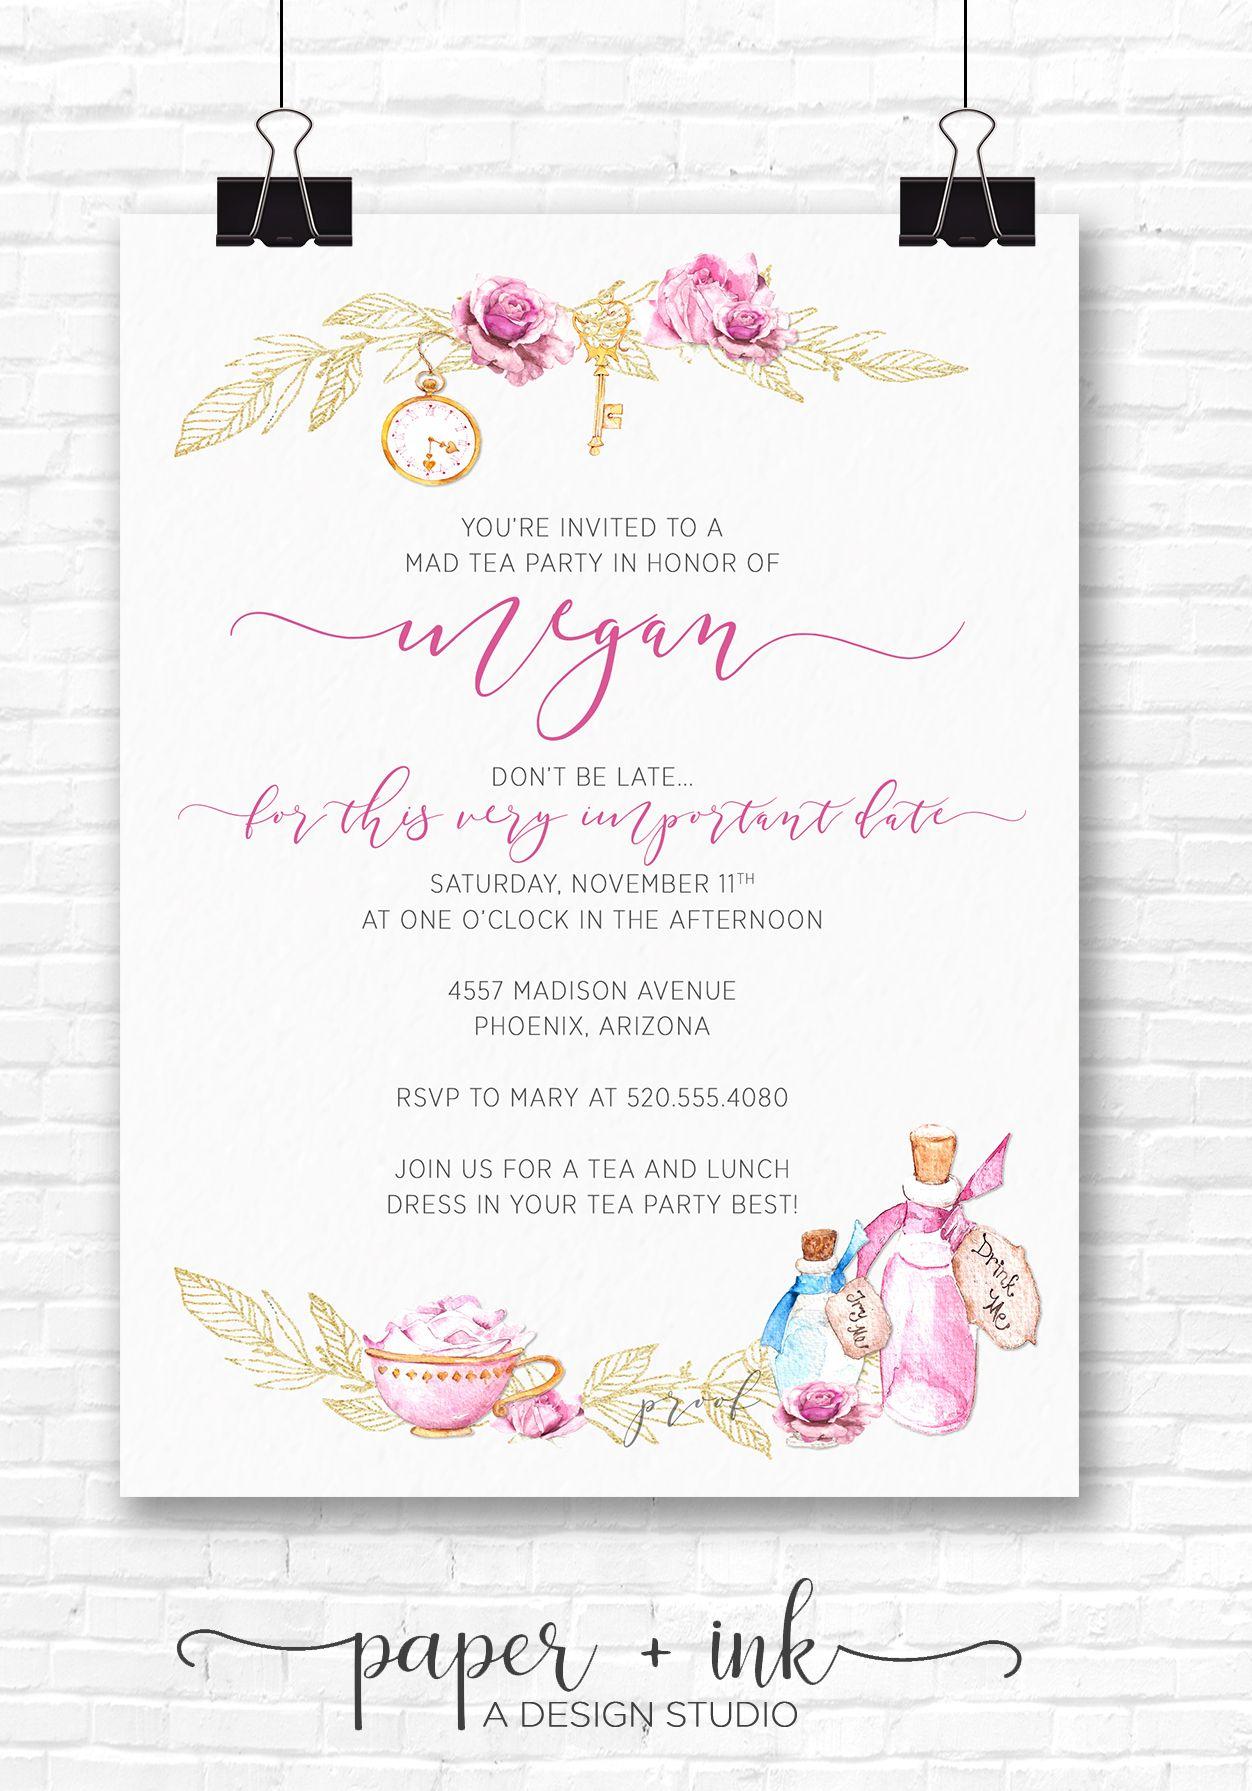 Mad Hatter Tea Party / Alice in Wonderland Invitation | paper + ink ...